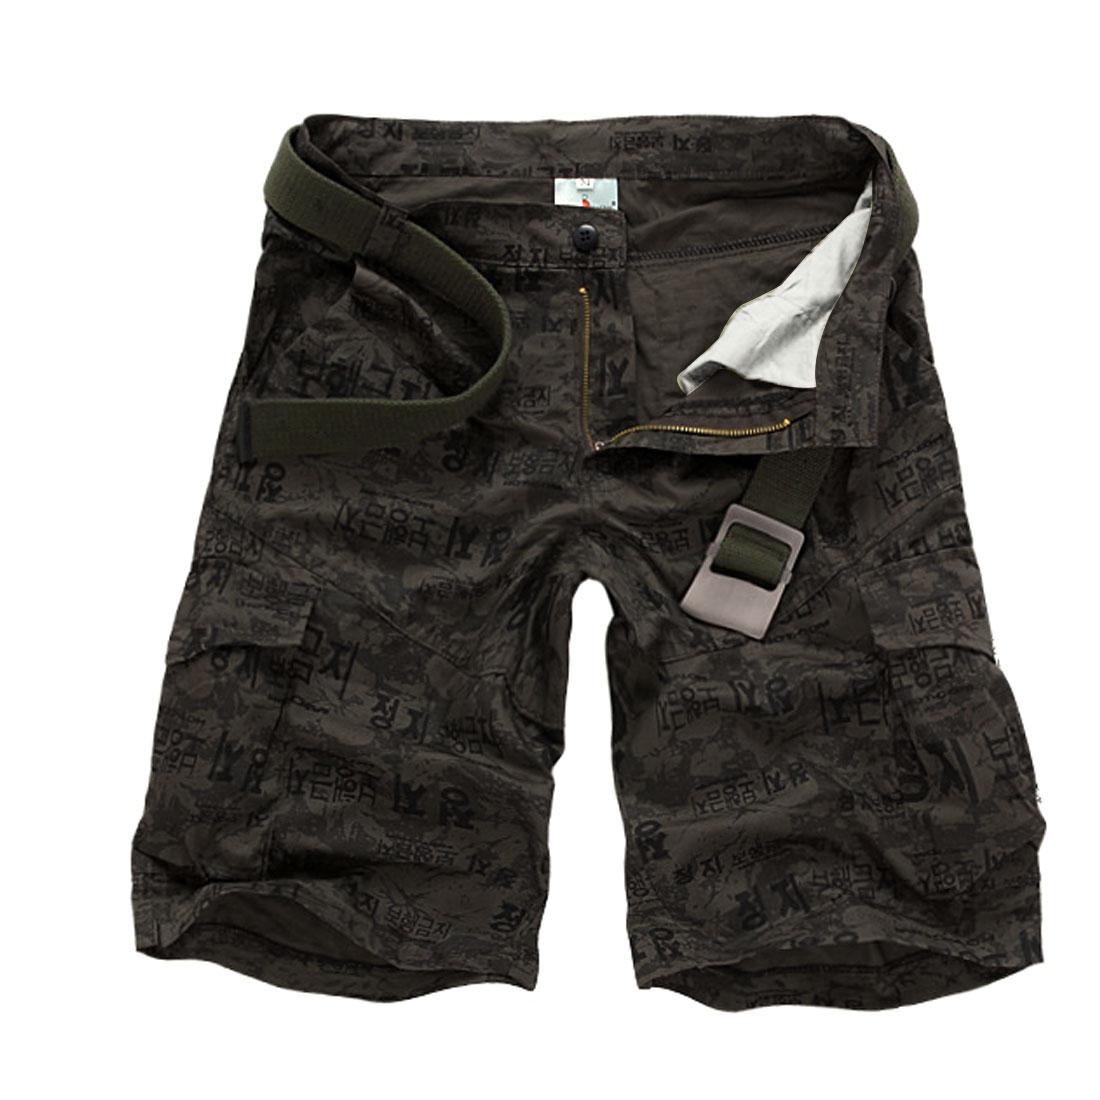 Men Waistband Loop Zip Up Slant Pockets Korean Letter Prints Short Pants Army Green M